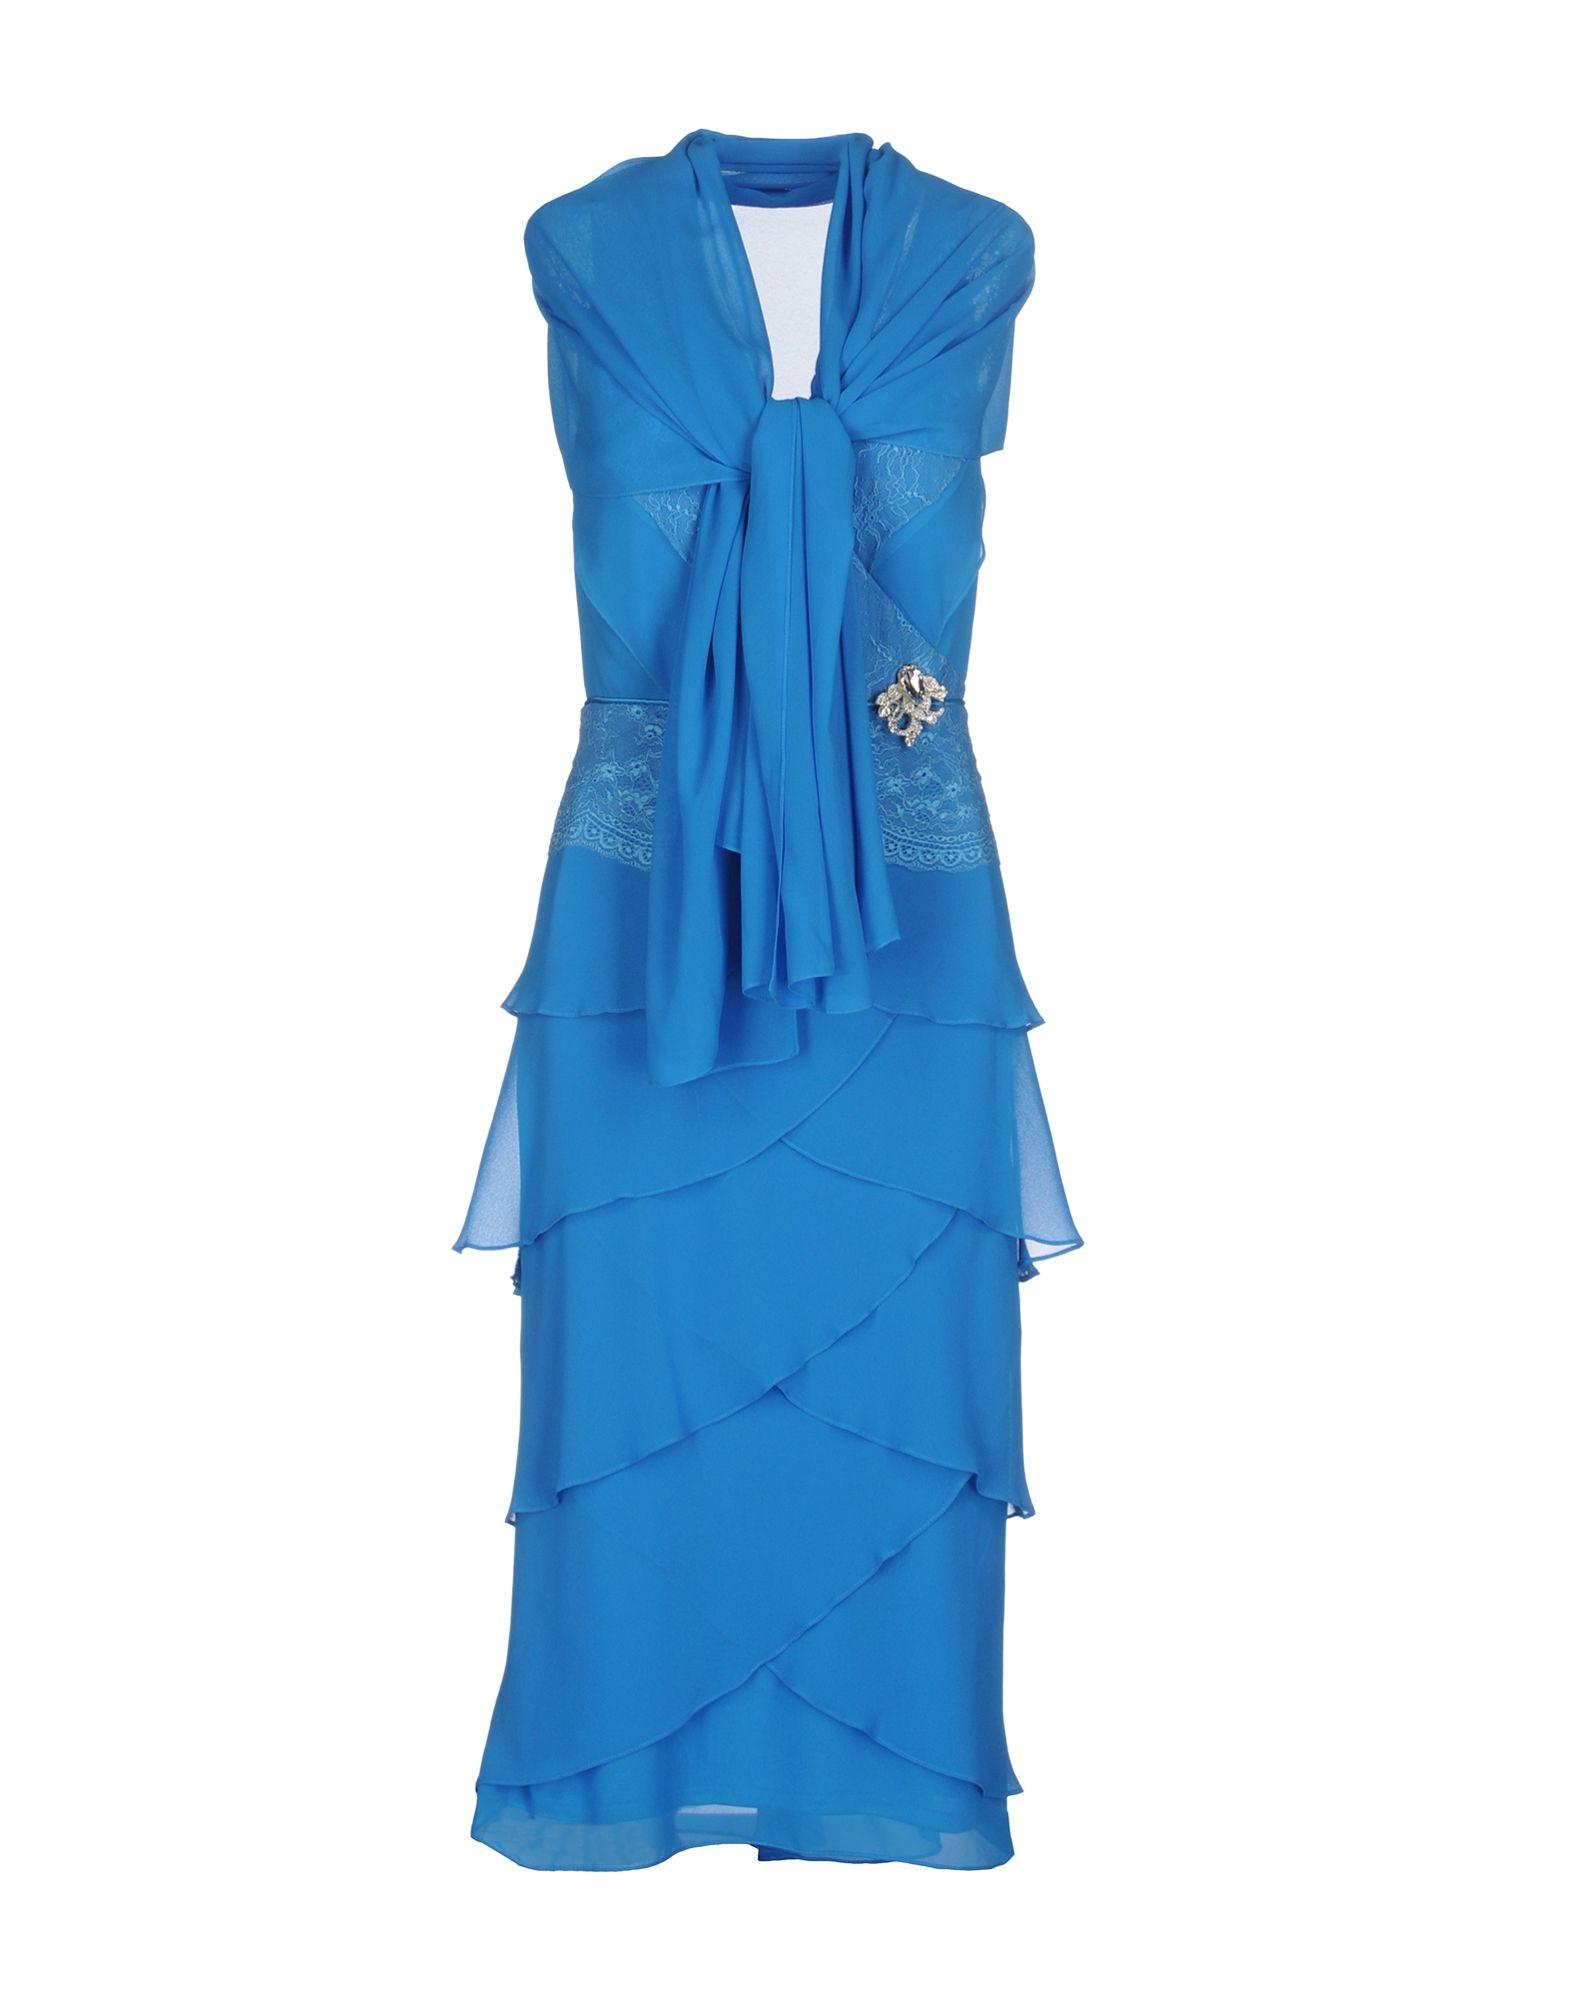 MUSANI COUTURE Платье длиной 3/4 moschino couture юбка длиной 3 4